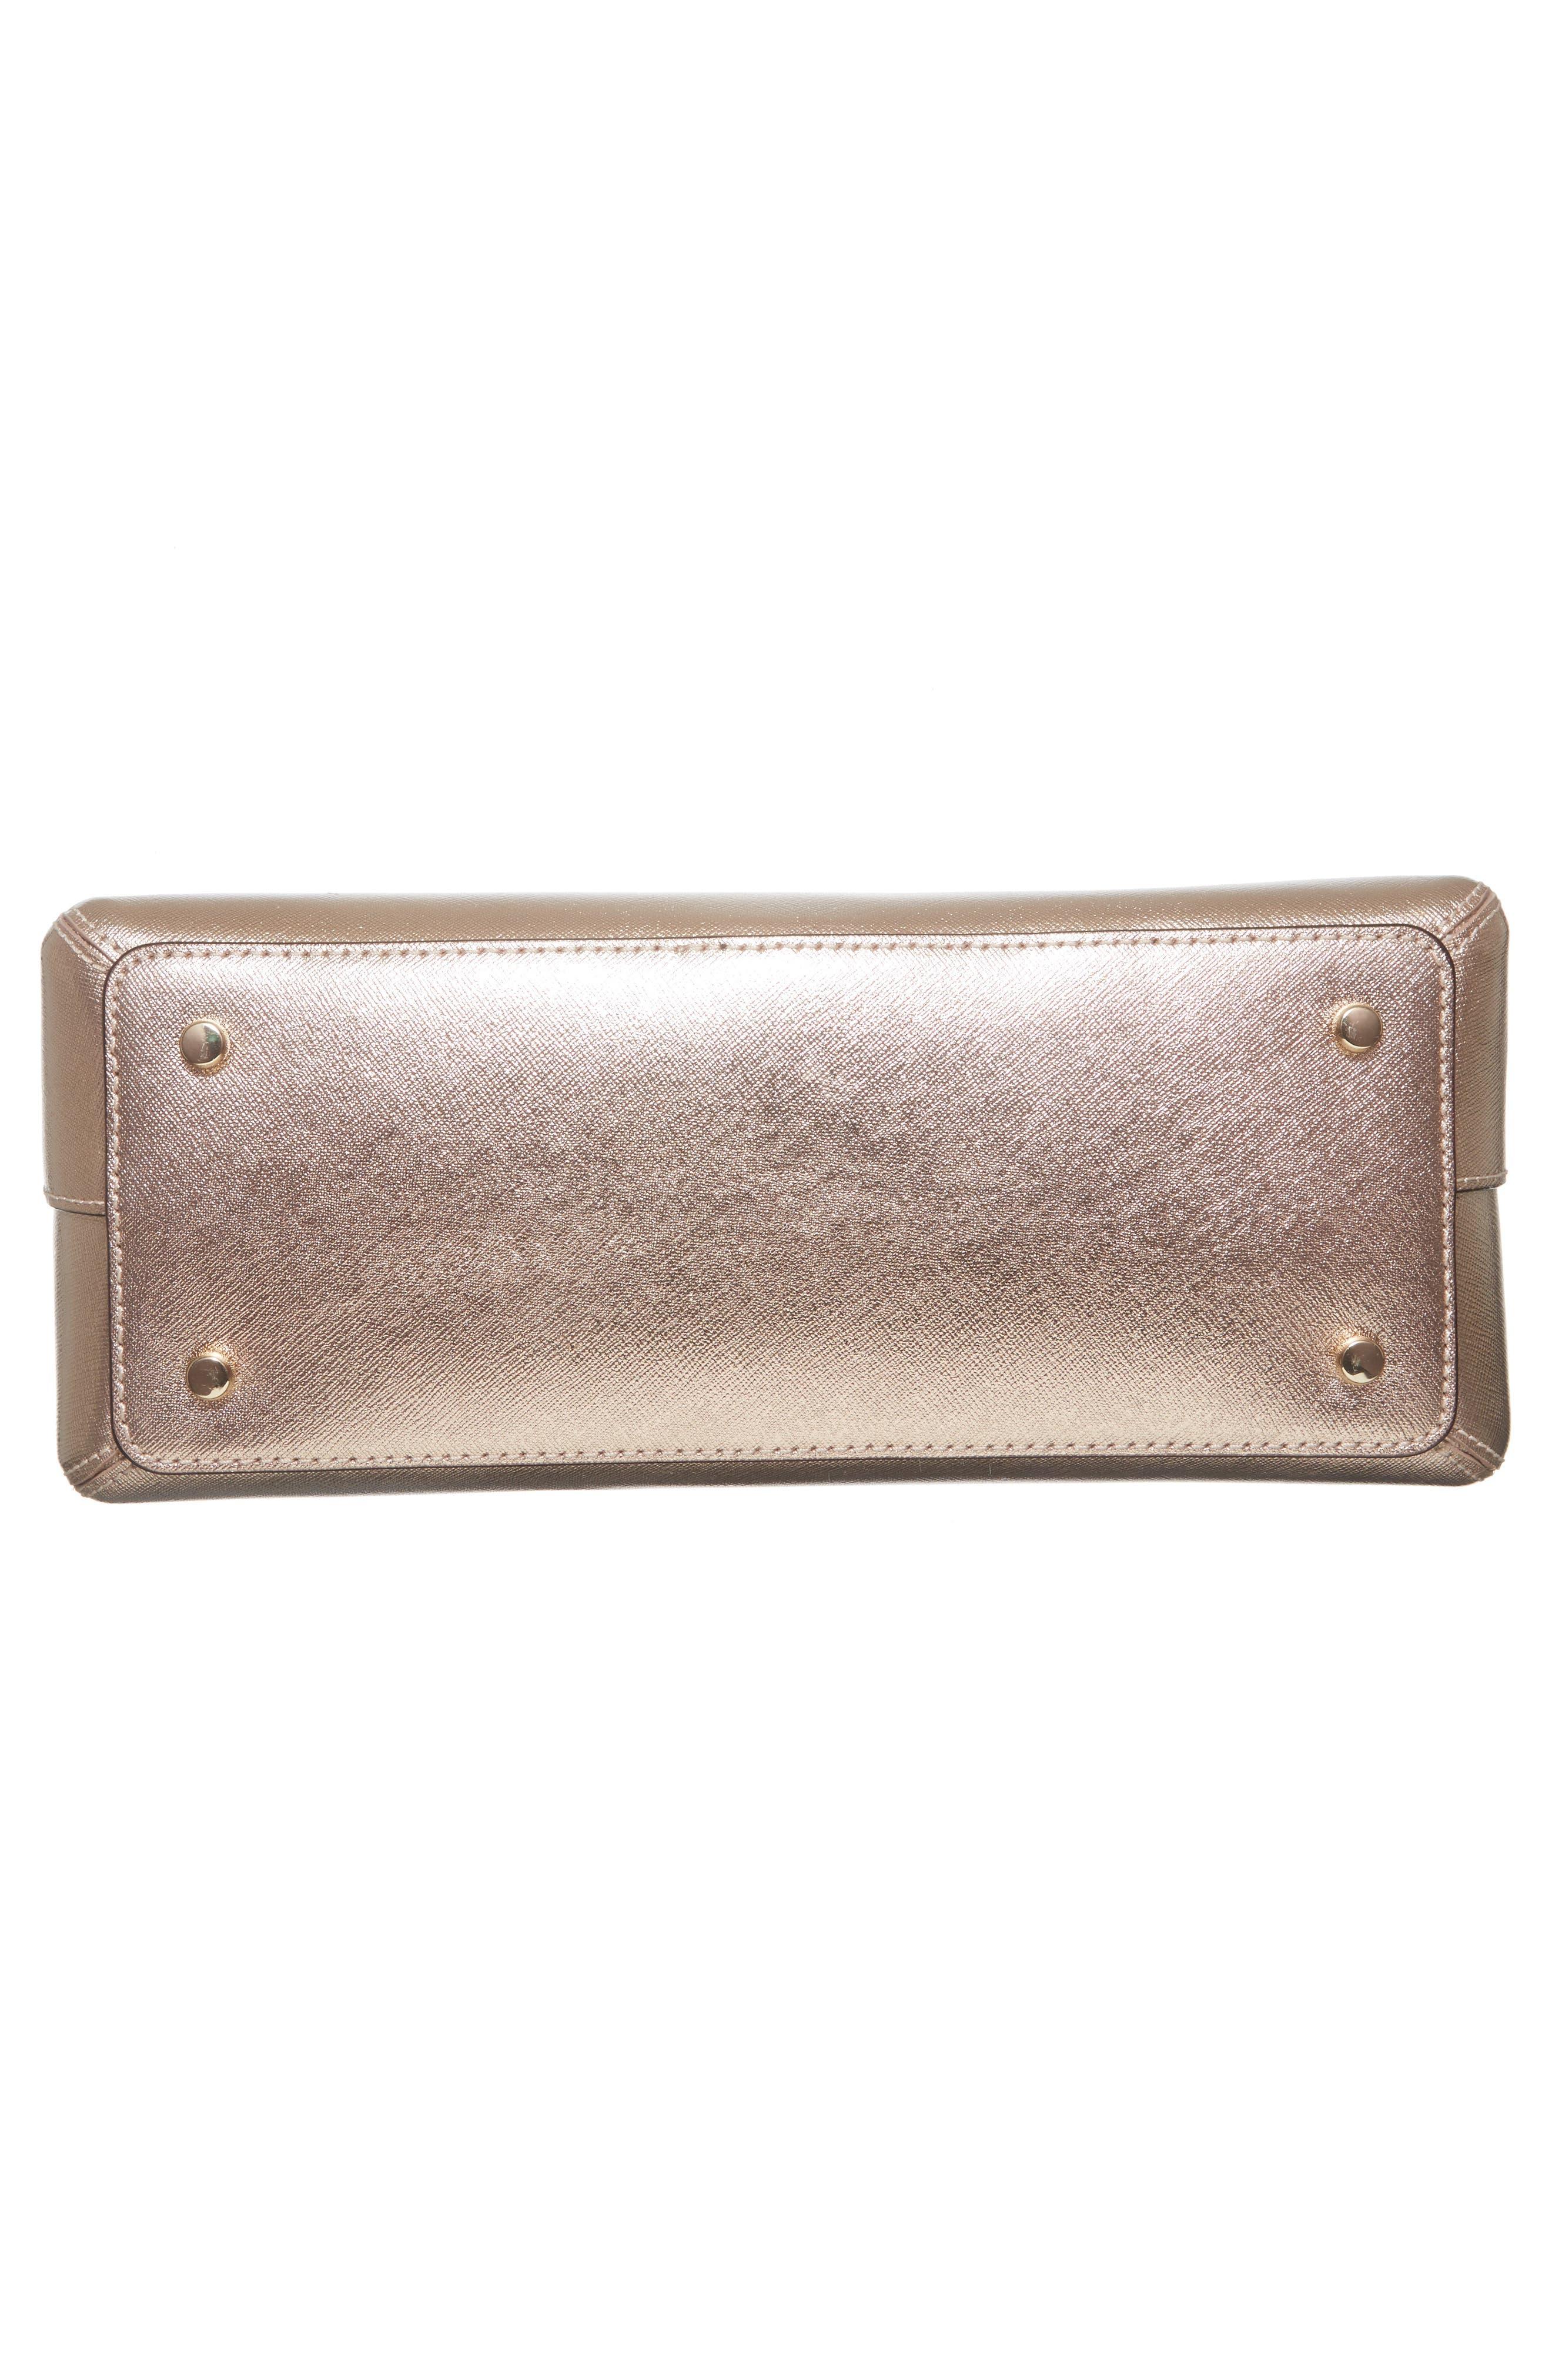 cameron street - maise satchel,                             Alternate thumbnail 6, color,                             650